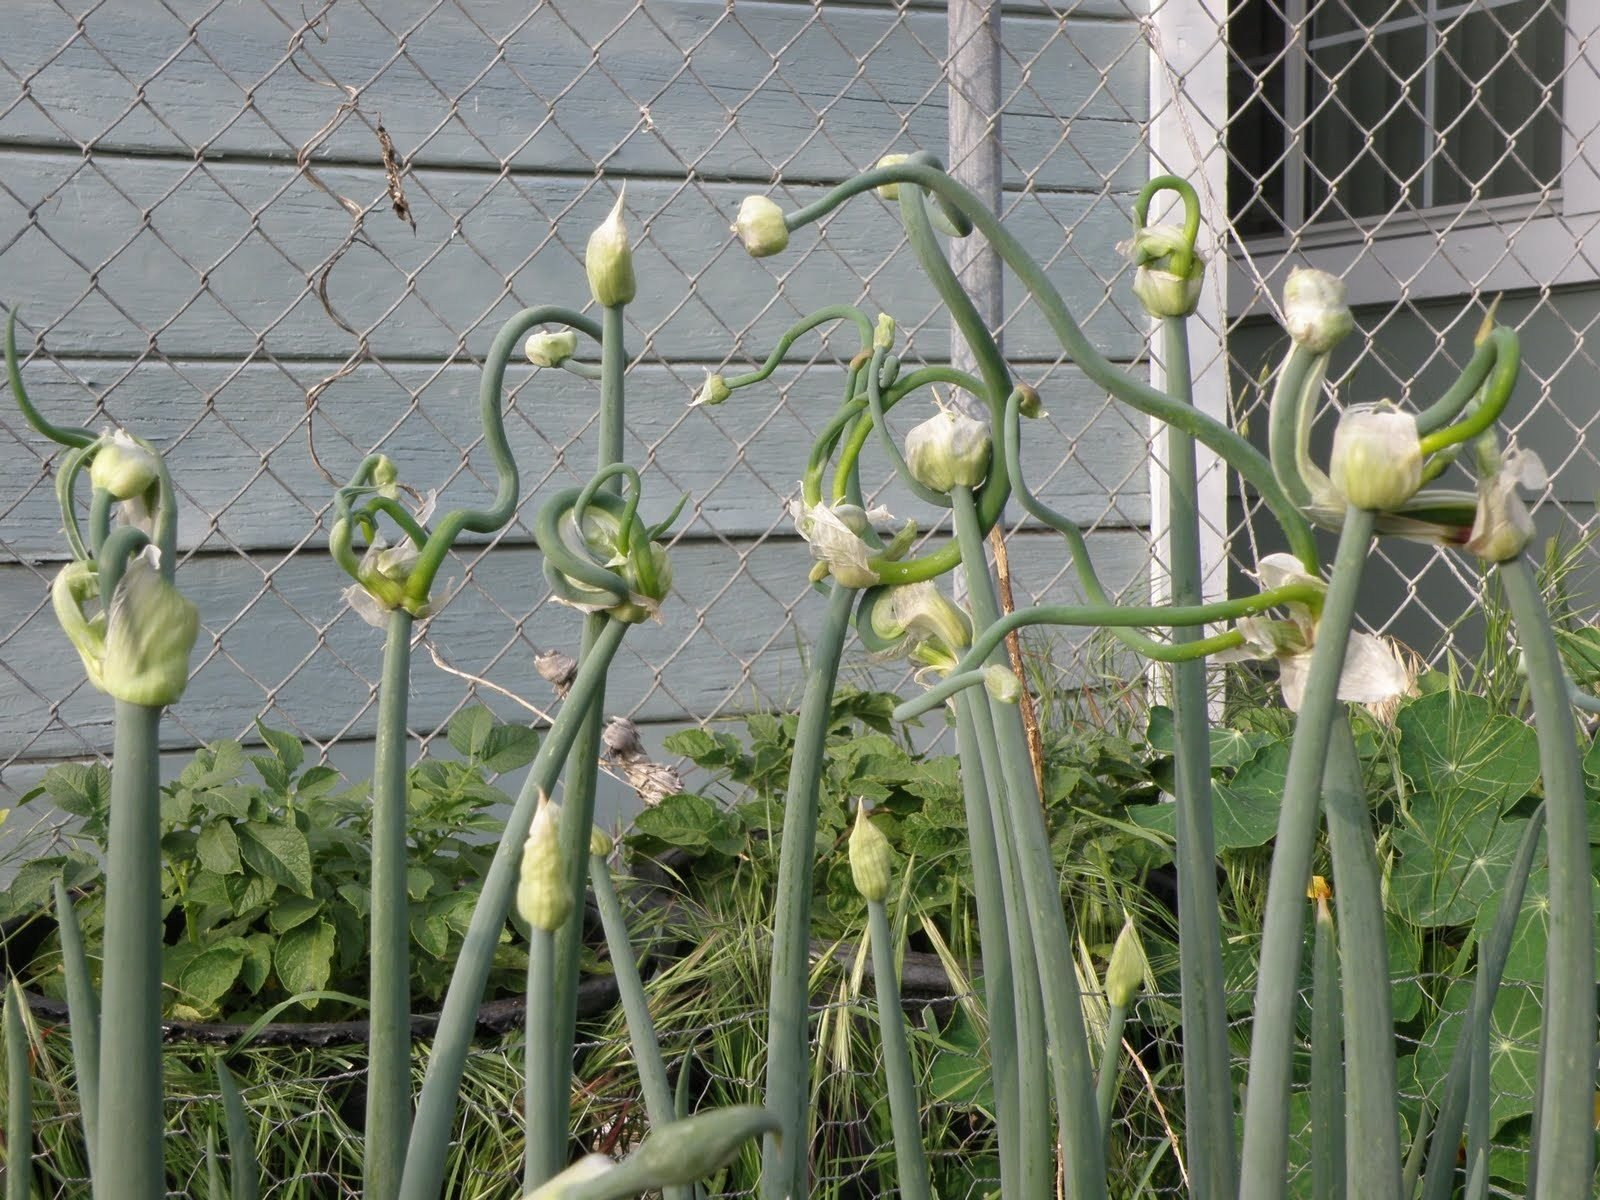 Heirloom Egyptian Walking Onions ★Catawissa Tree Onion ★NON GMO ★ 10 Bulbils